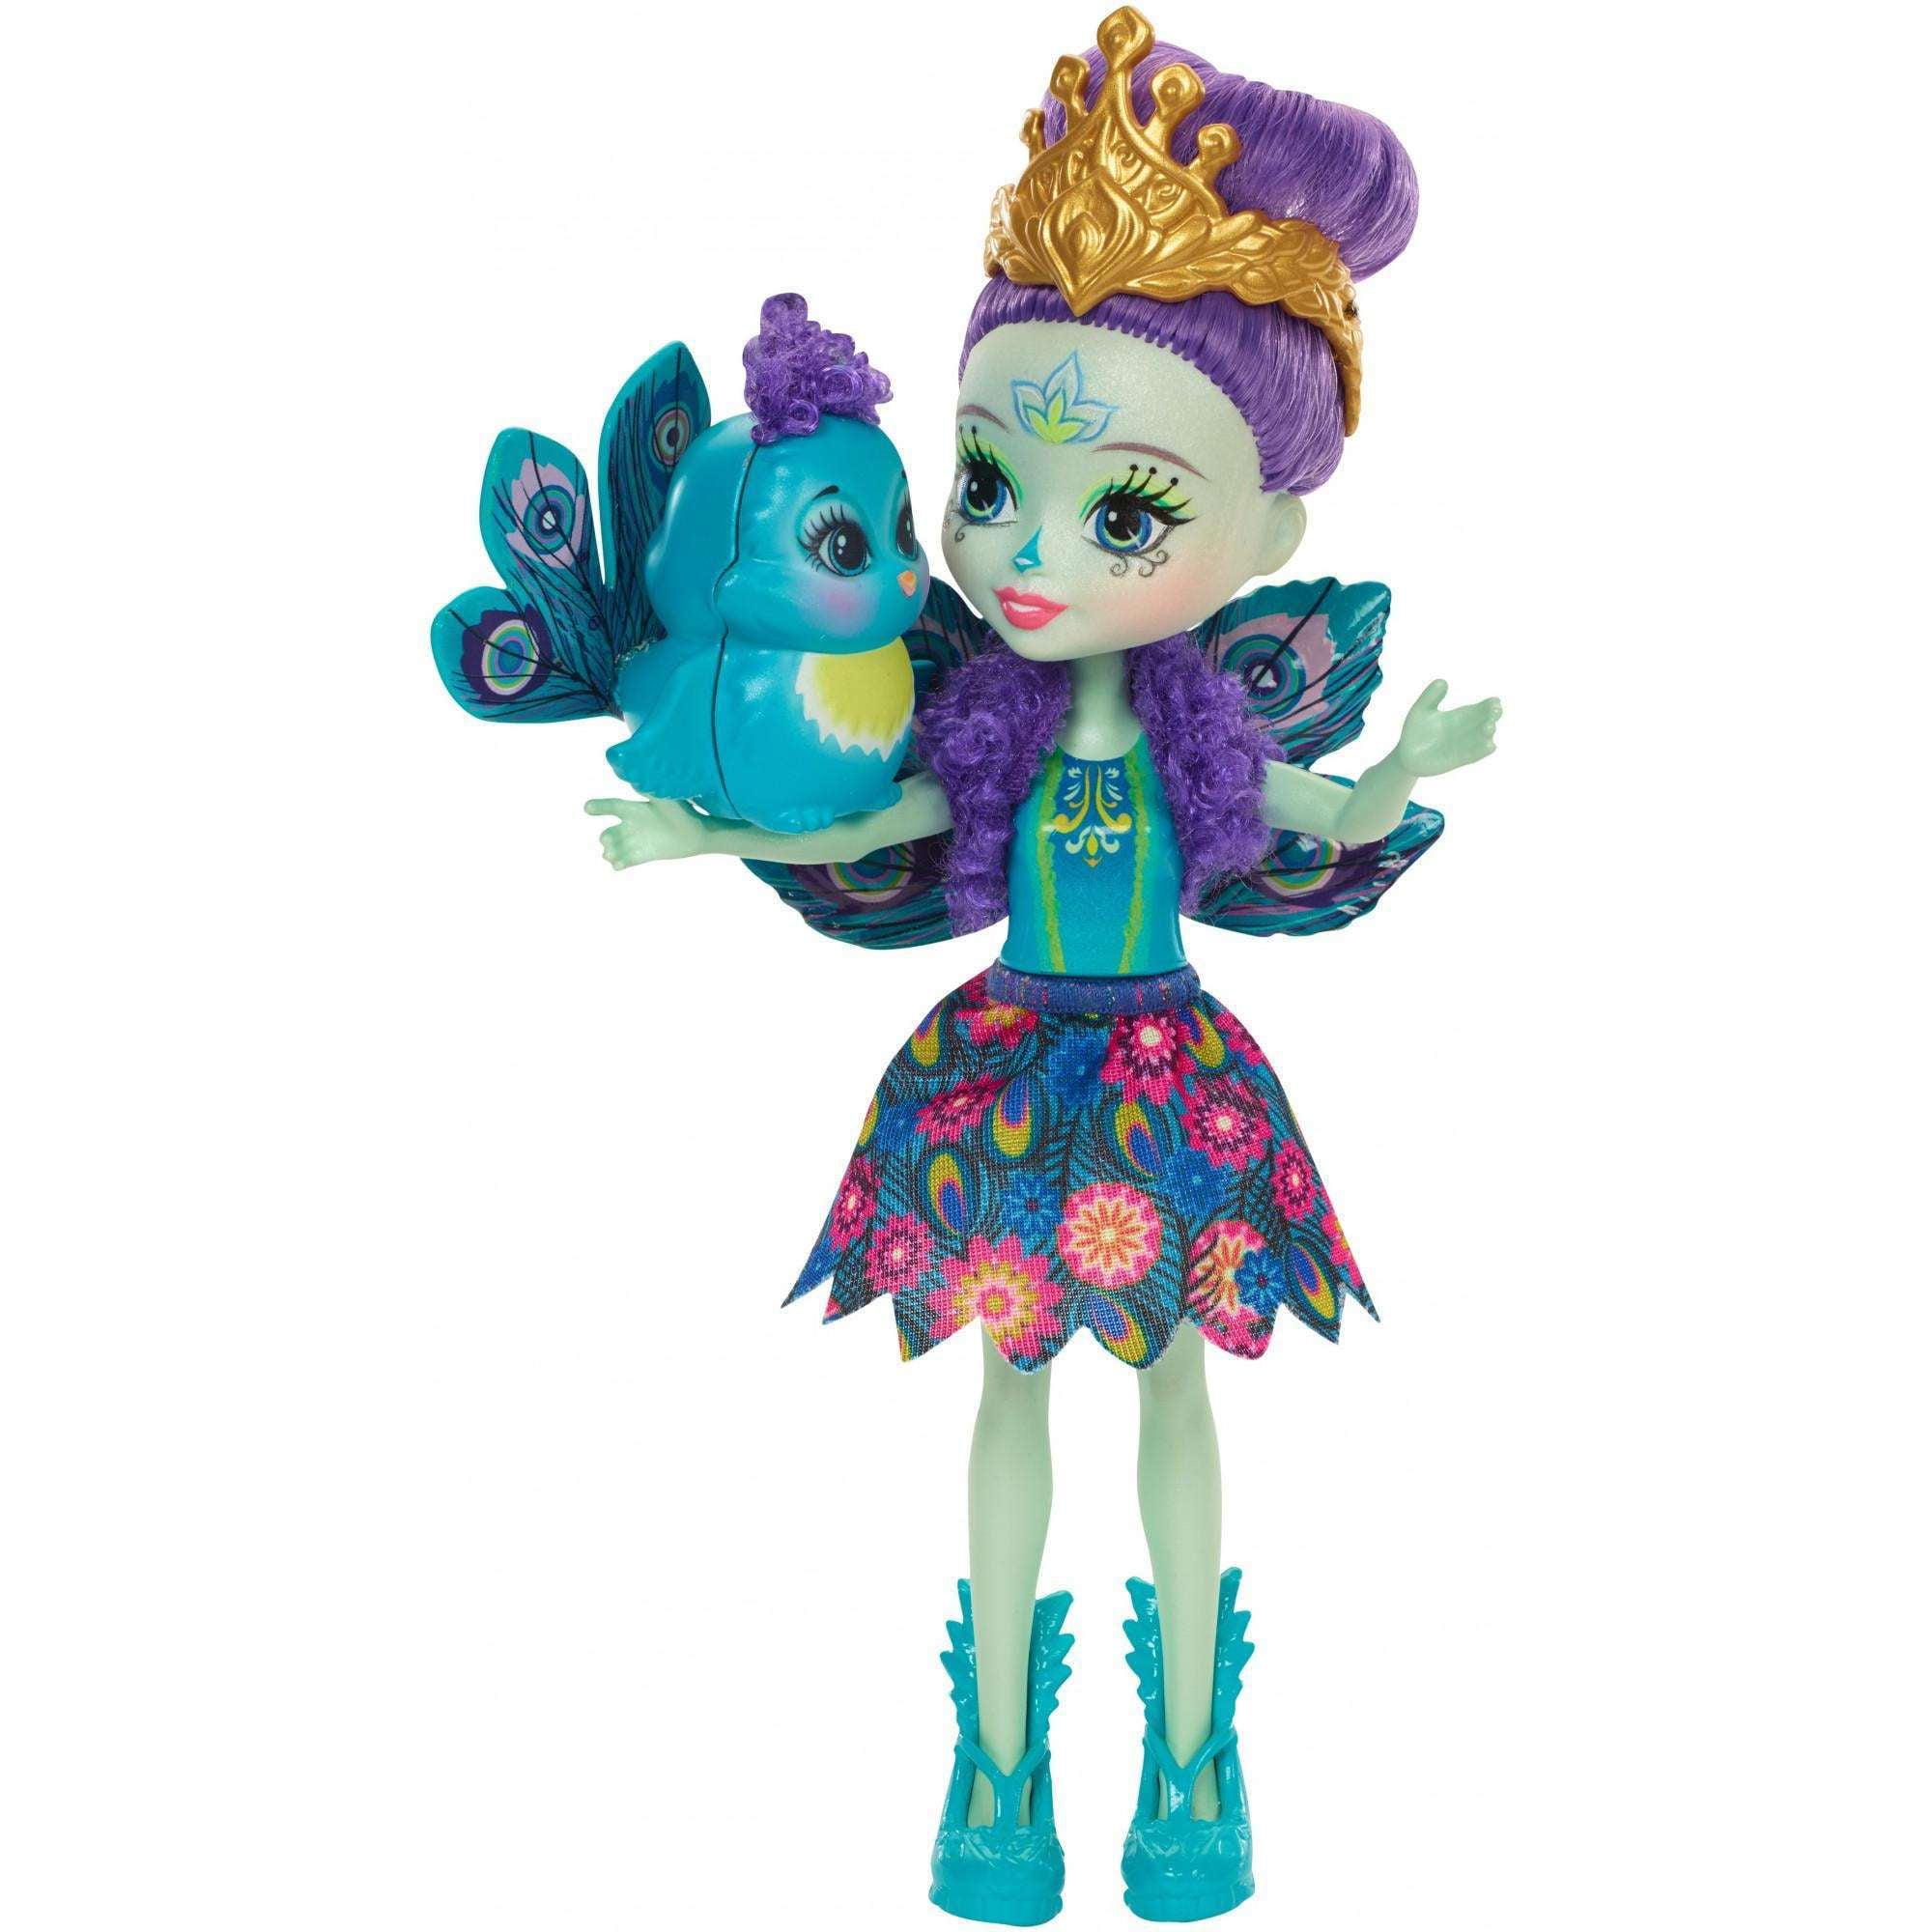 Enchantimals Patter Peacock Doll by Mattel